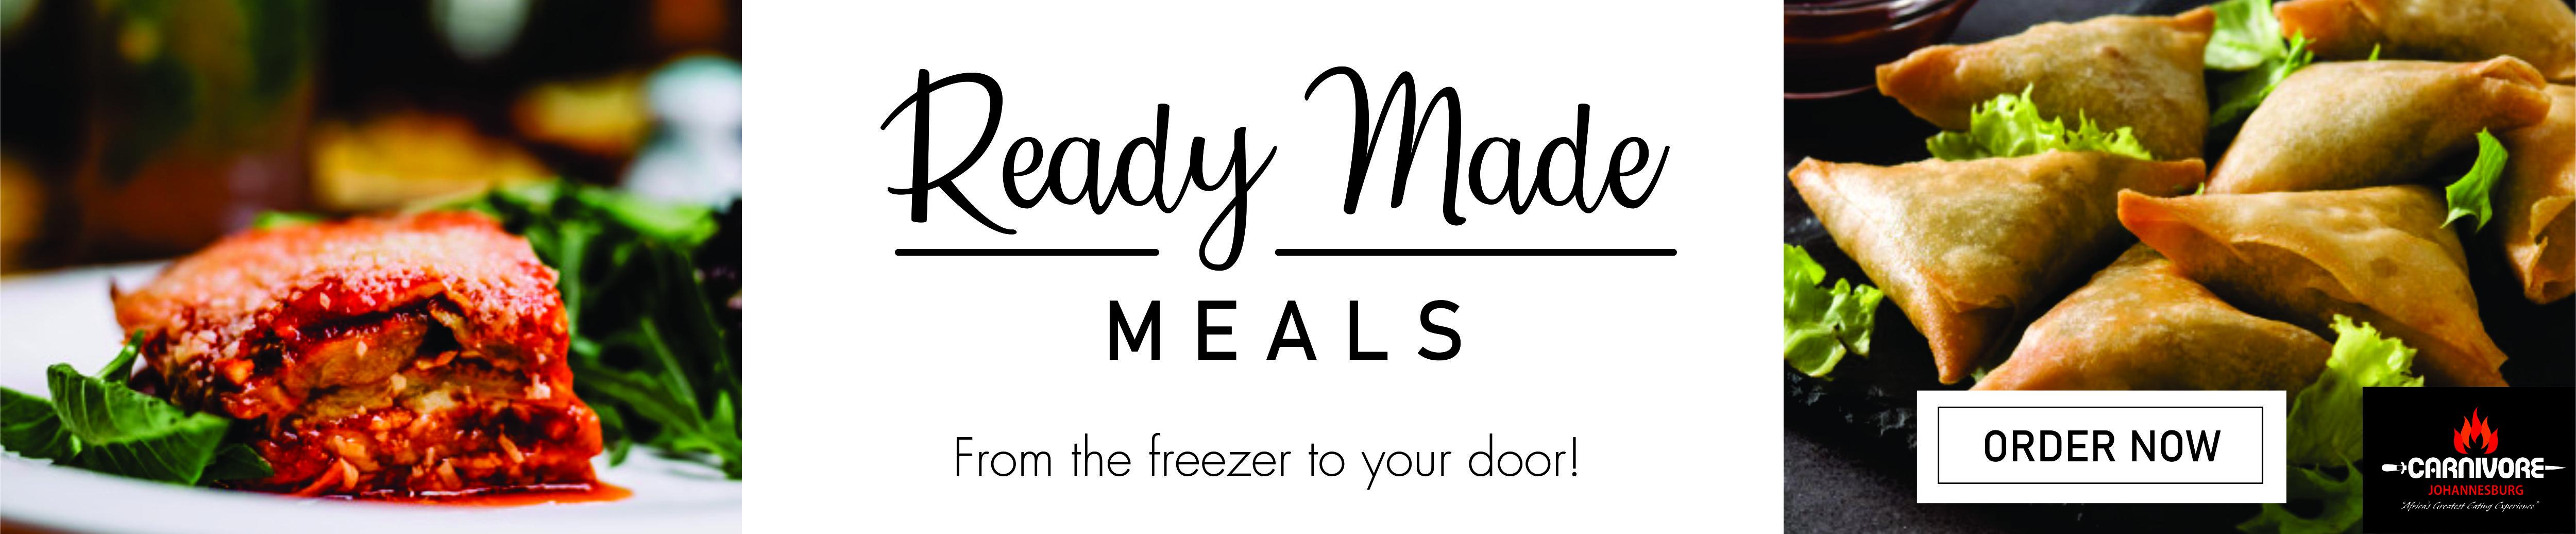 Kedar Lodge Ready Made Meals